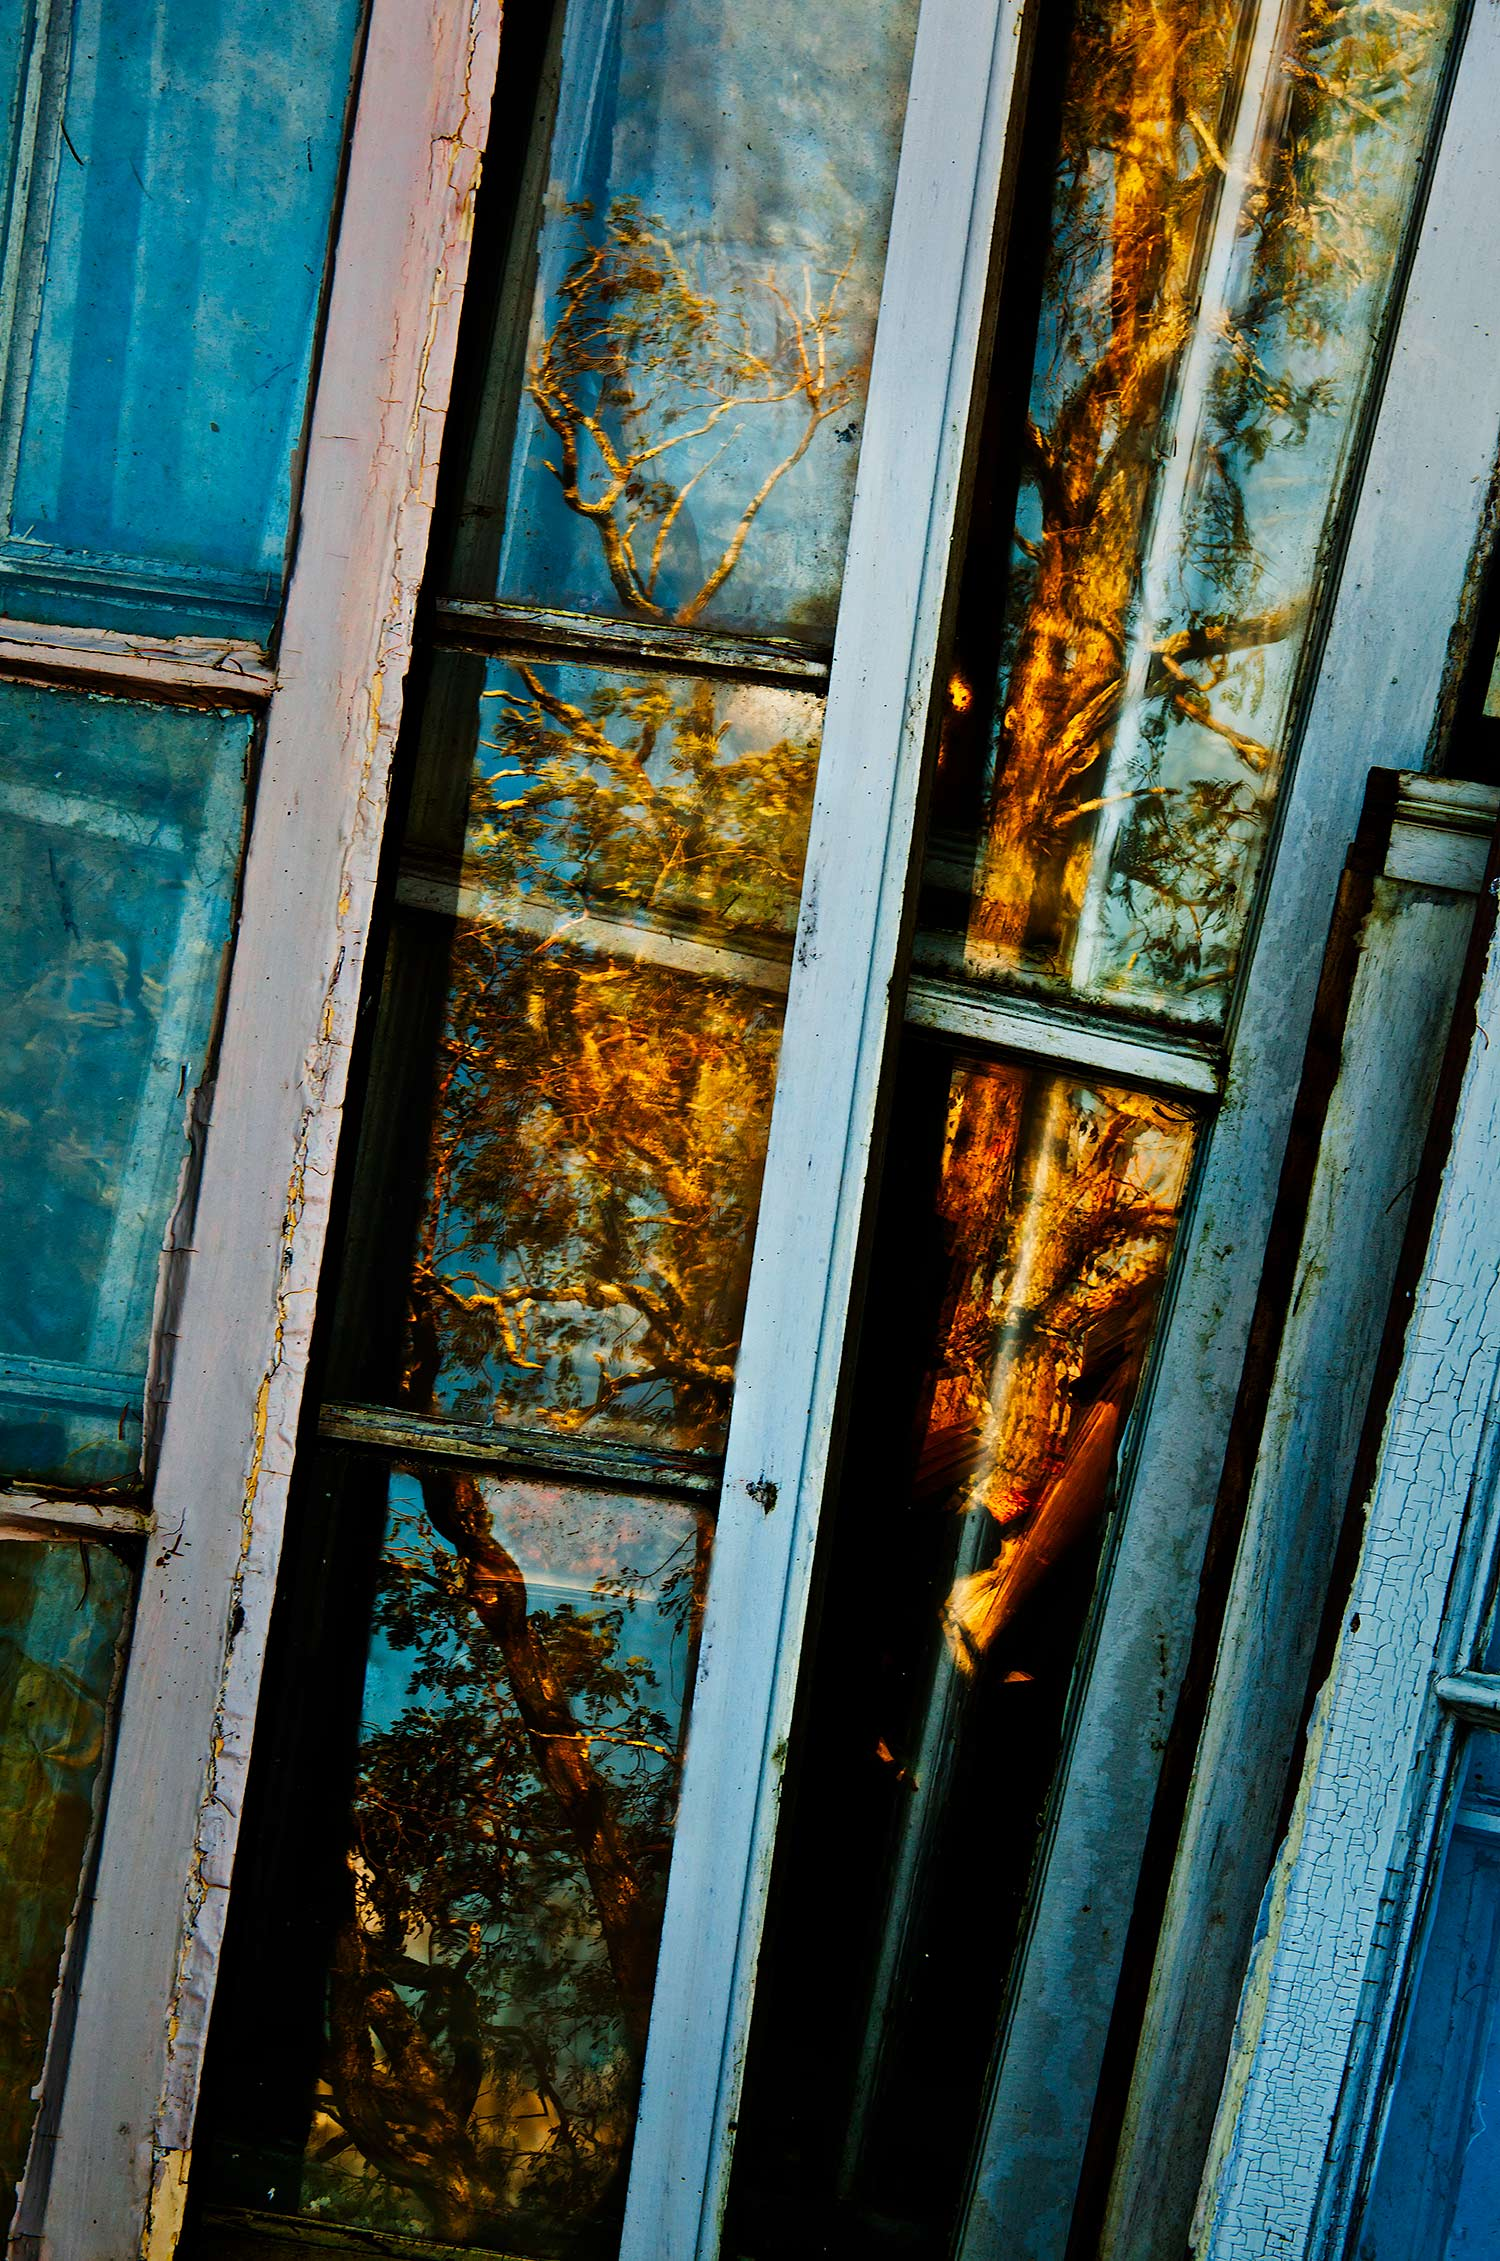 Windows, Bar Harbor, Maine, 2011